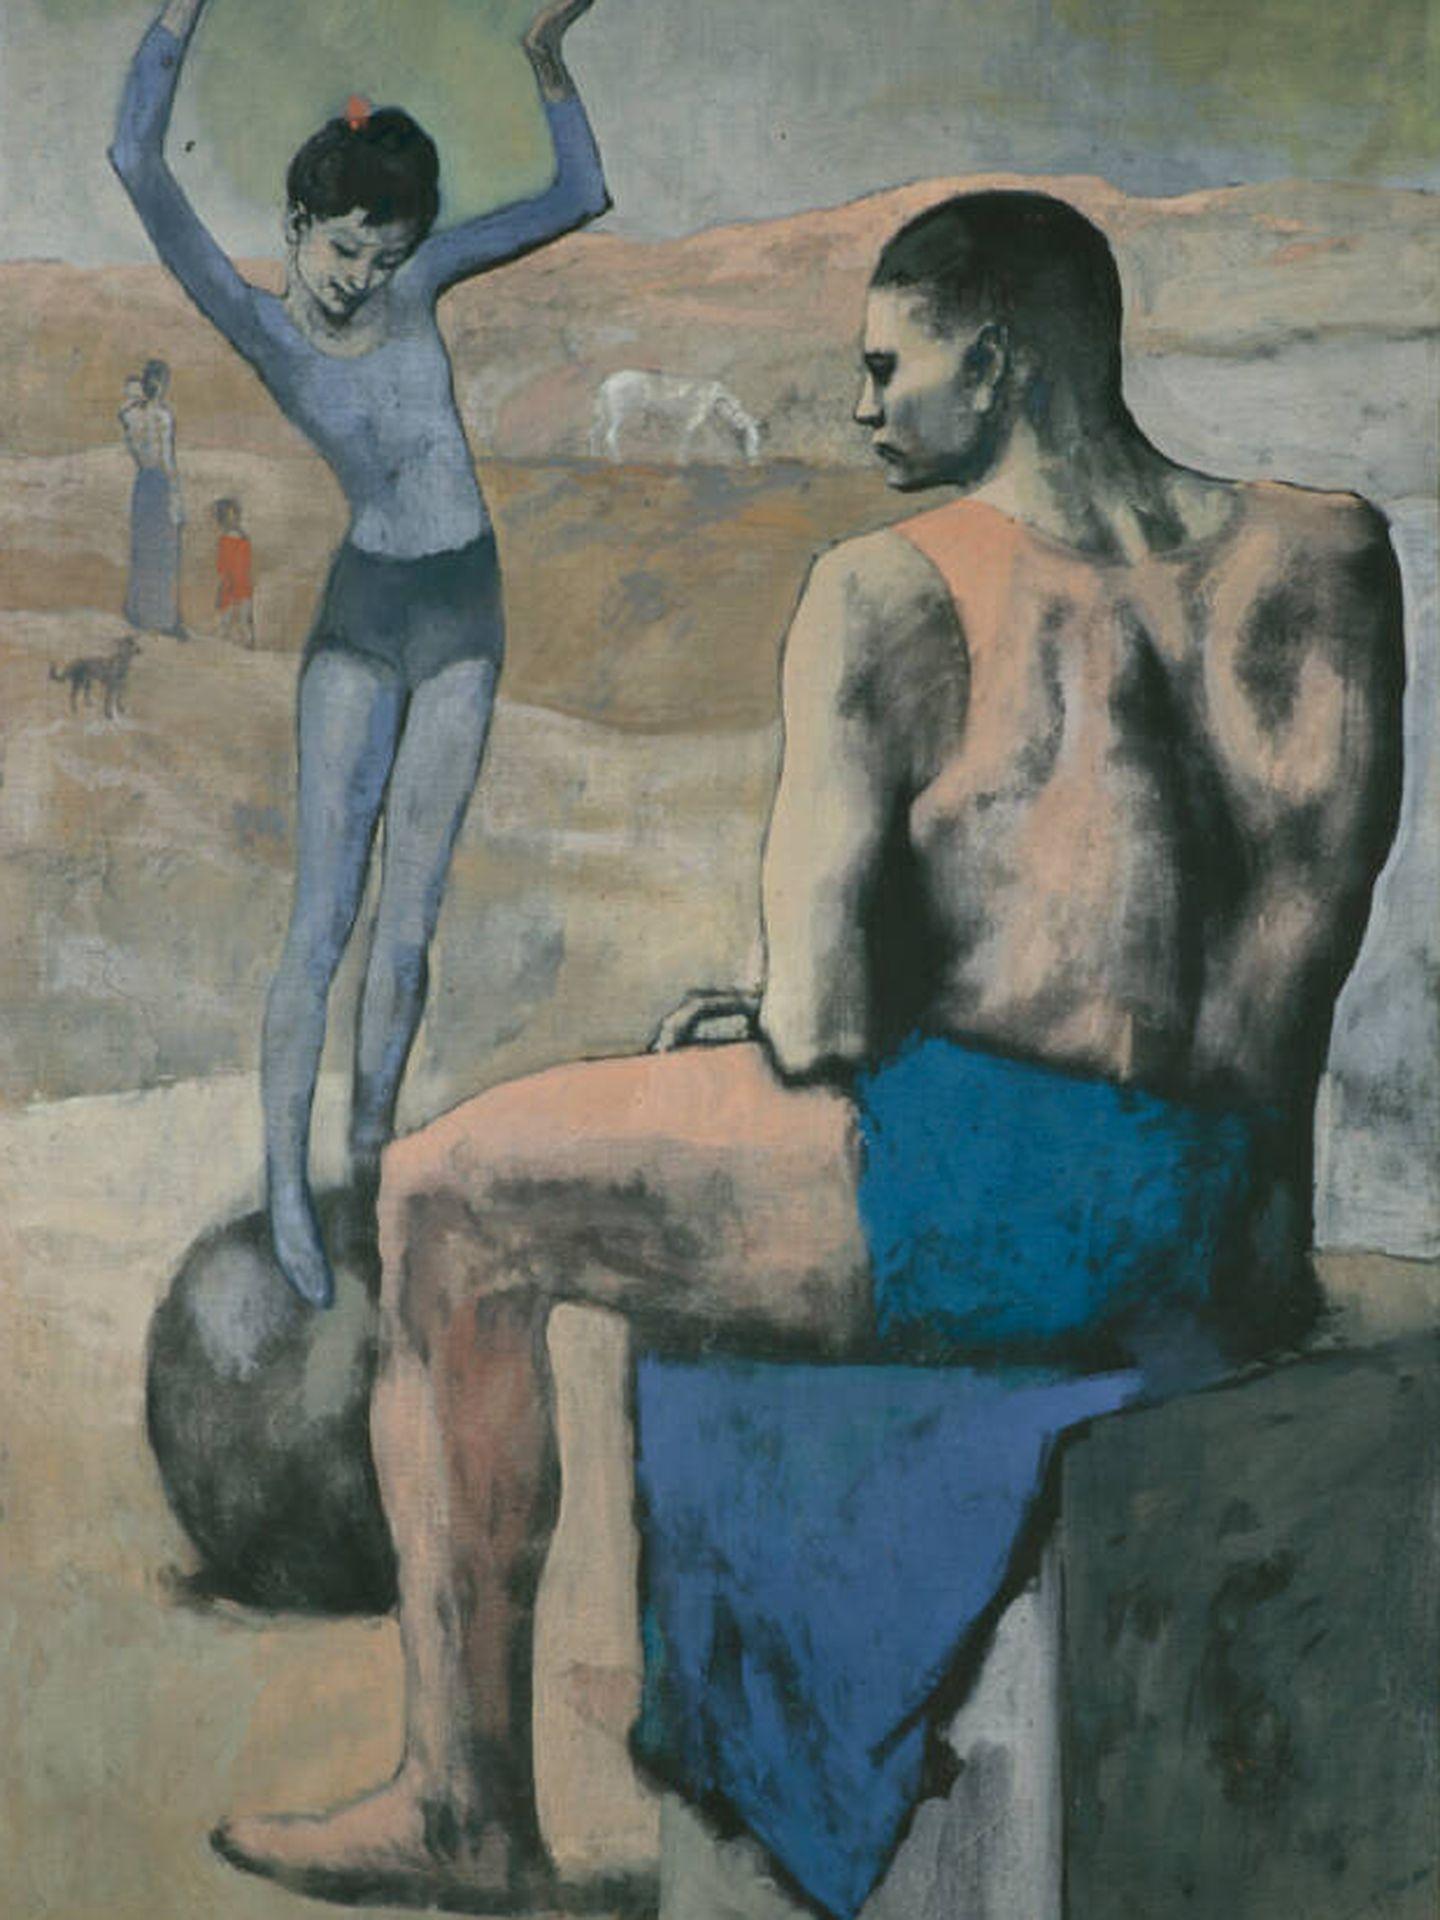 'La acróbata de la bola', Pablo Picasso, 1905. Museo Pushkin.